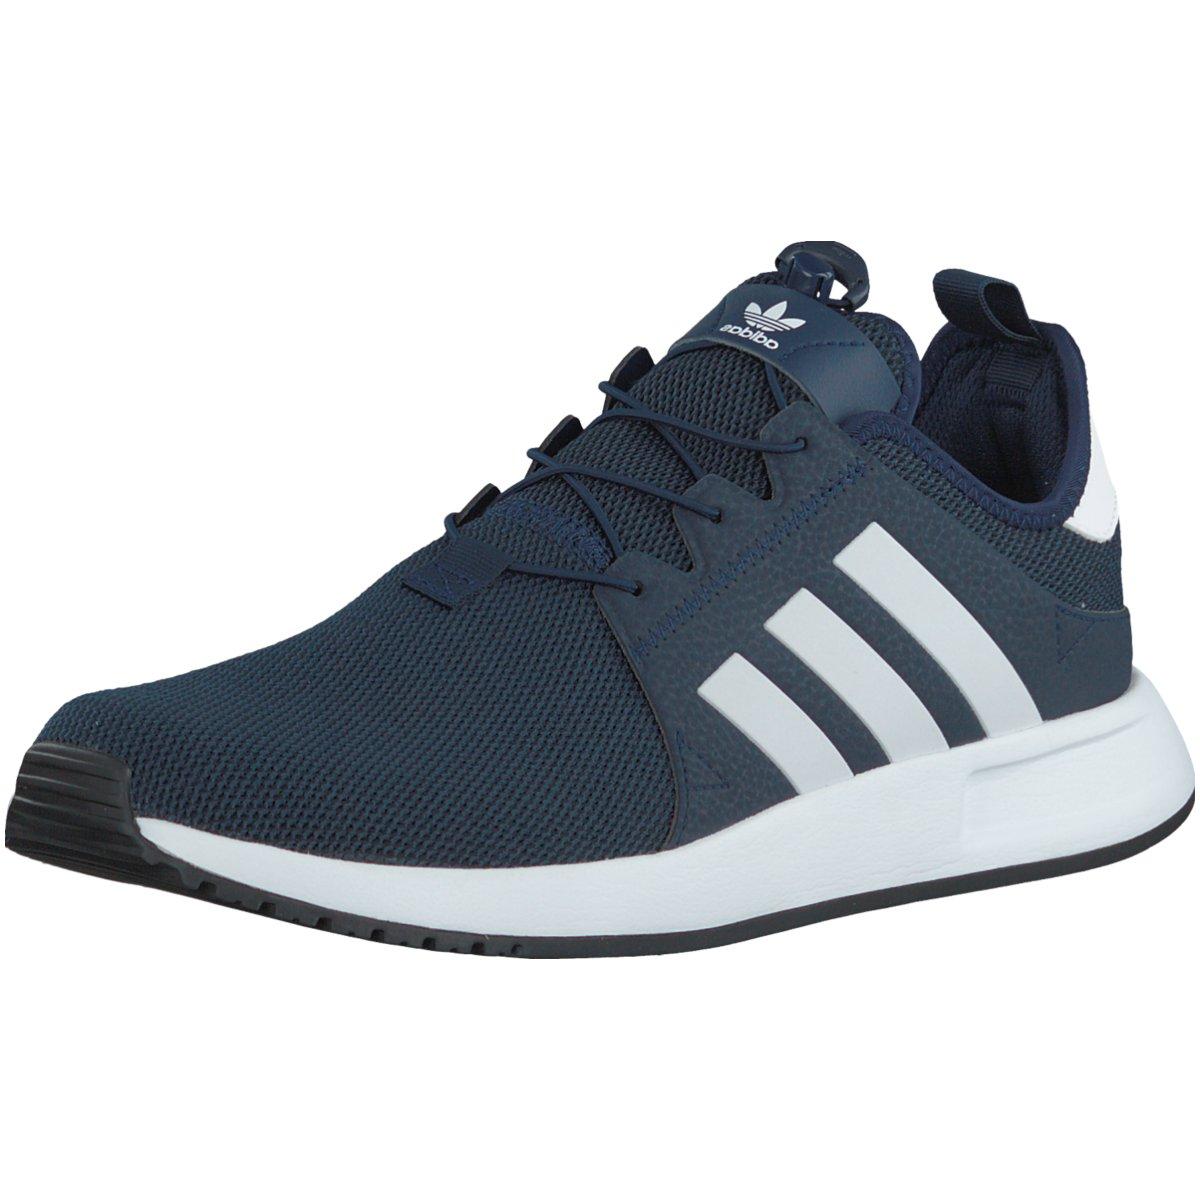 Details zu #S2K adidas Originals Herren Sneaker X_PLR Sneaker Herren Schuhe blau weiß